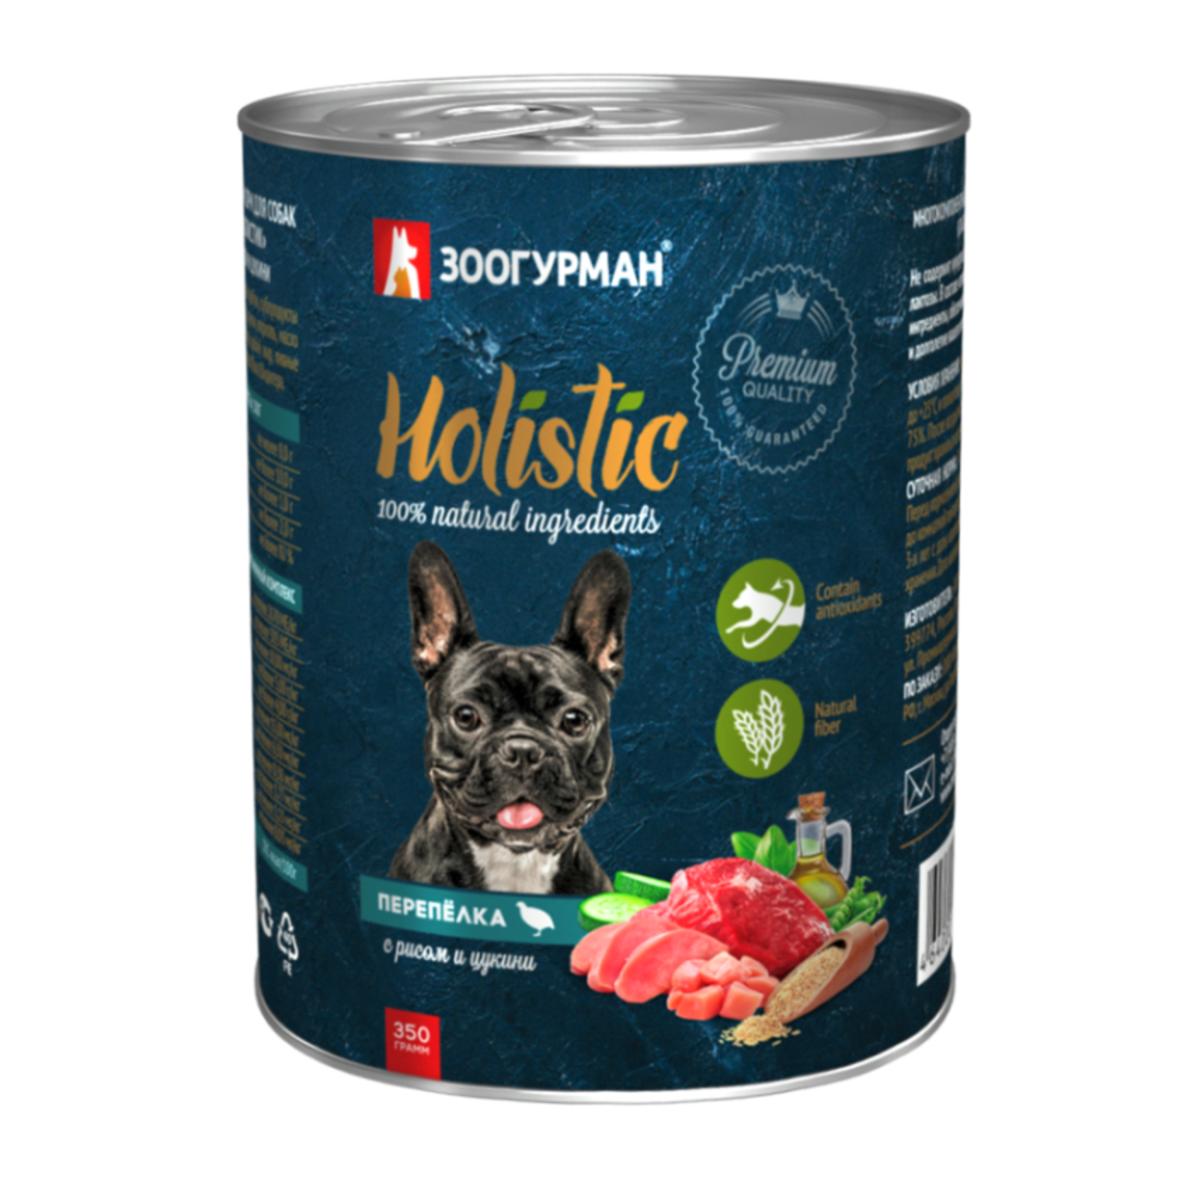 Влажный корм для собак ЗООГУРМАН Холистик (Holistic) Перепелка с рисом и цукини 350г